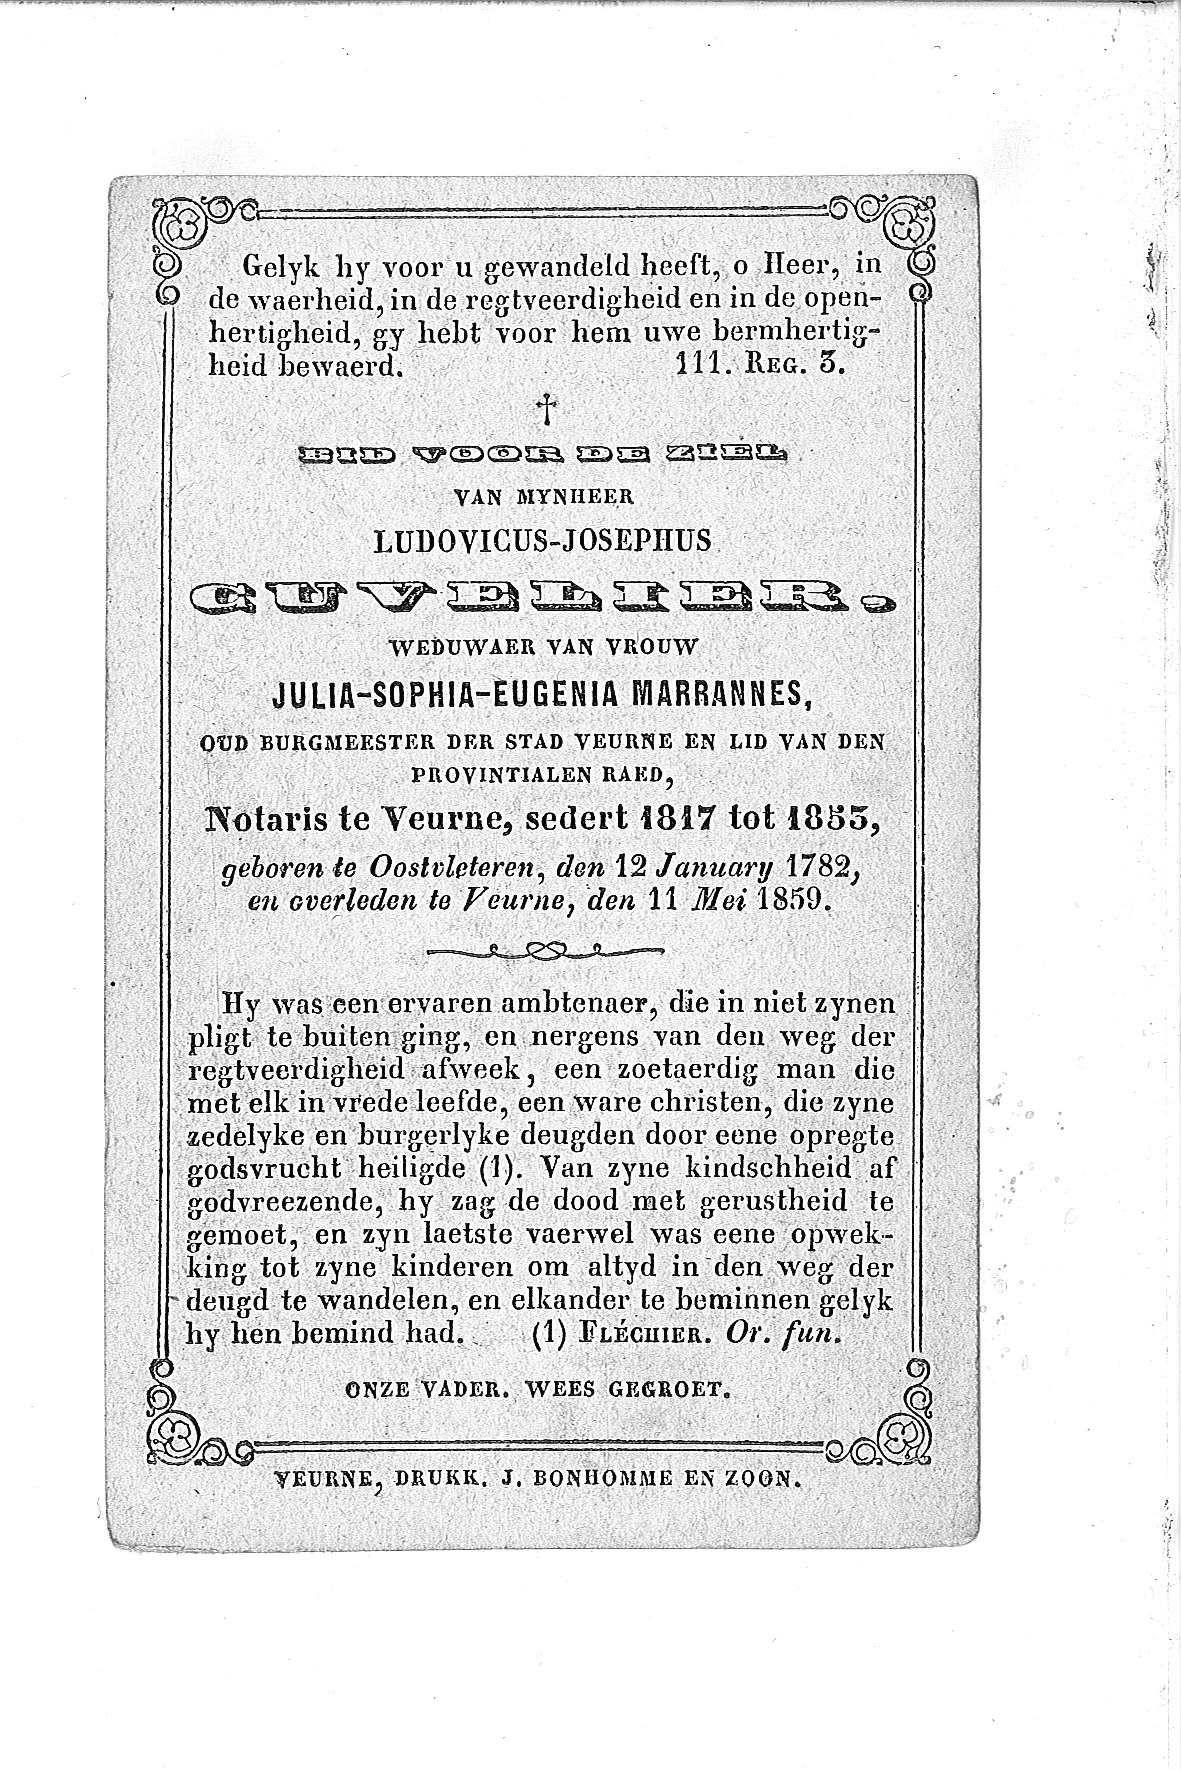 Ludovicus-Josephus (1859) 20120123114116_00033.jpg